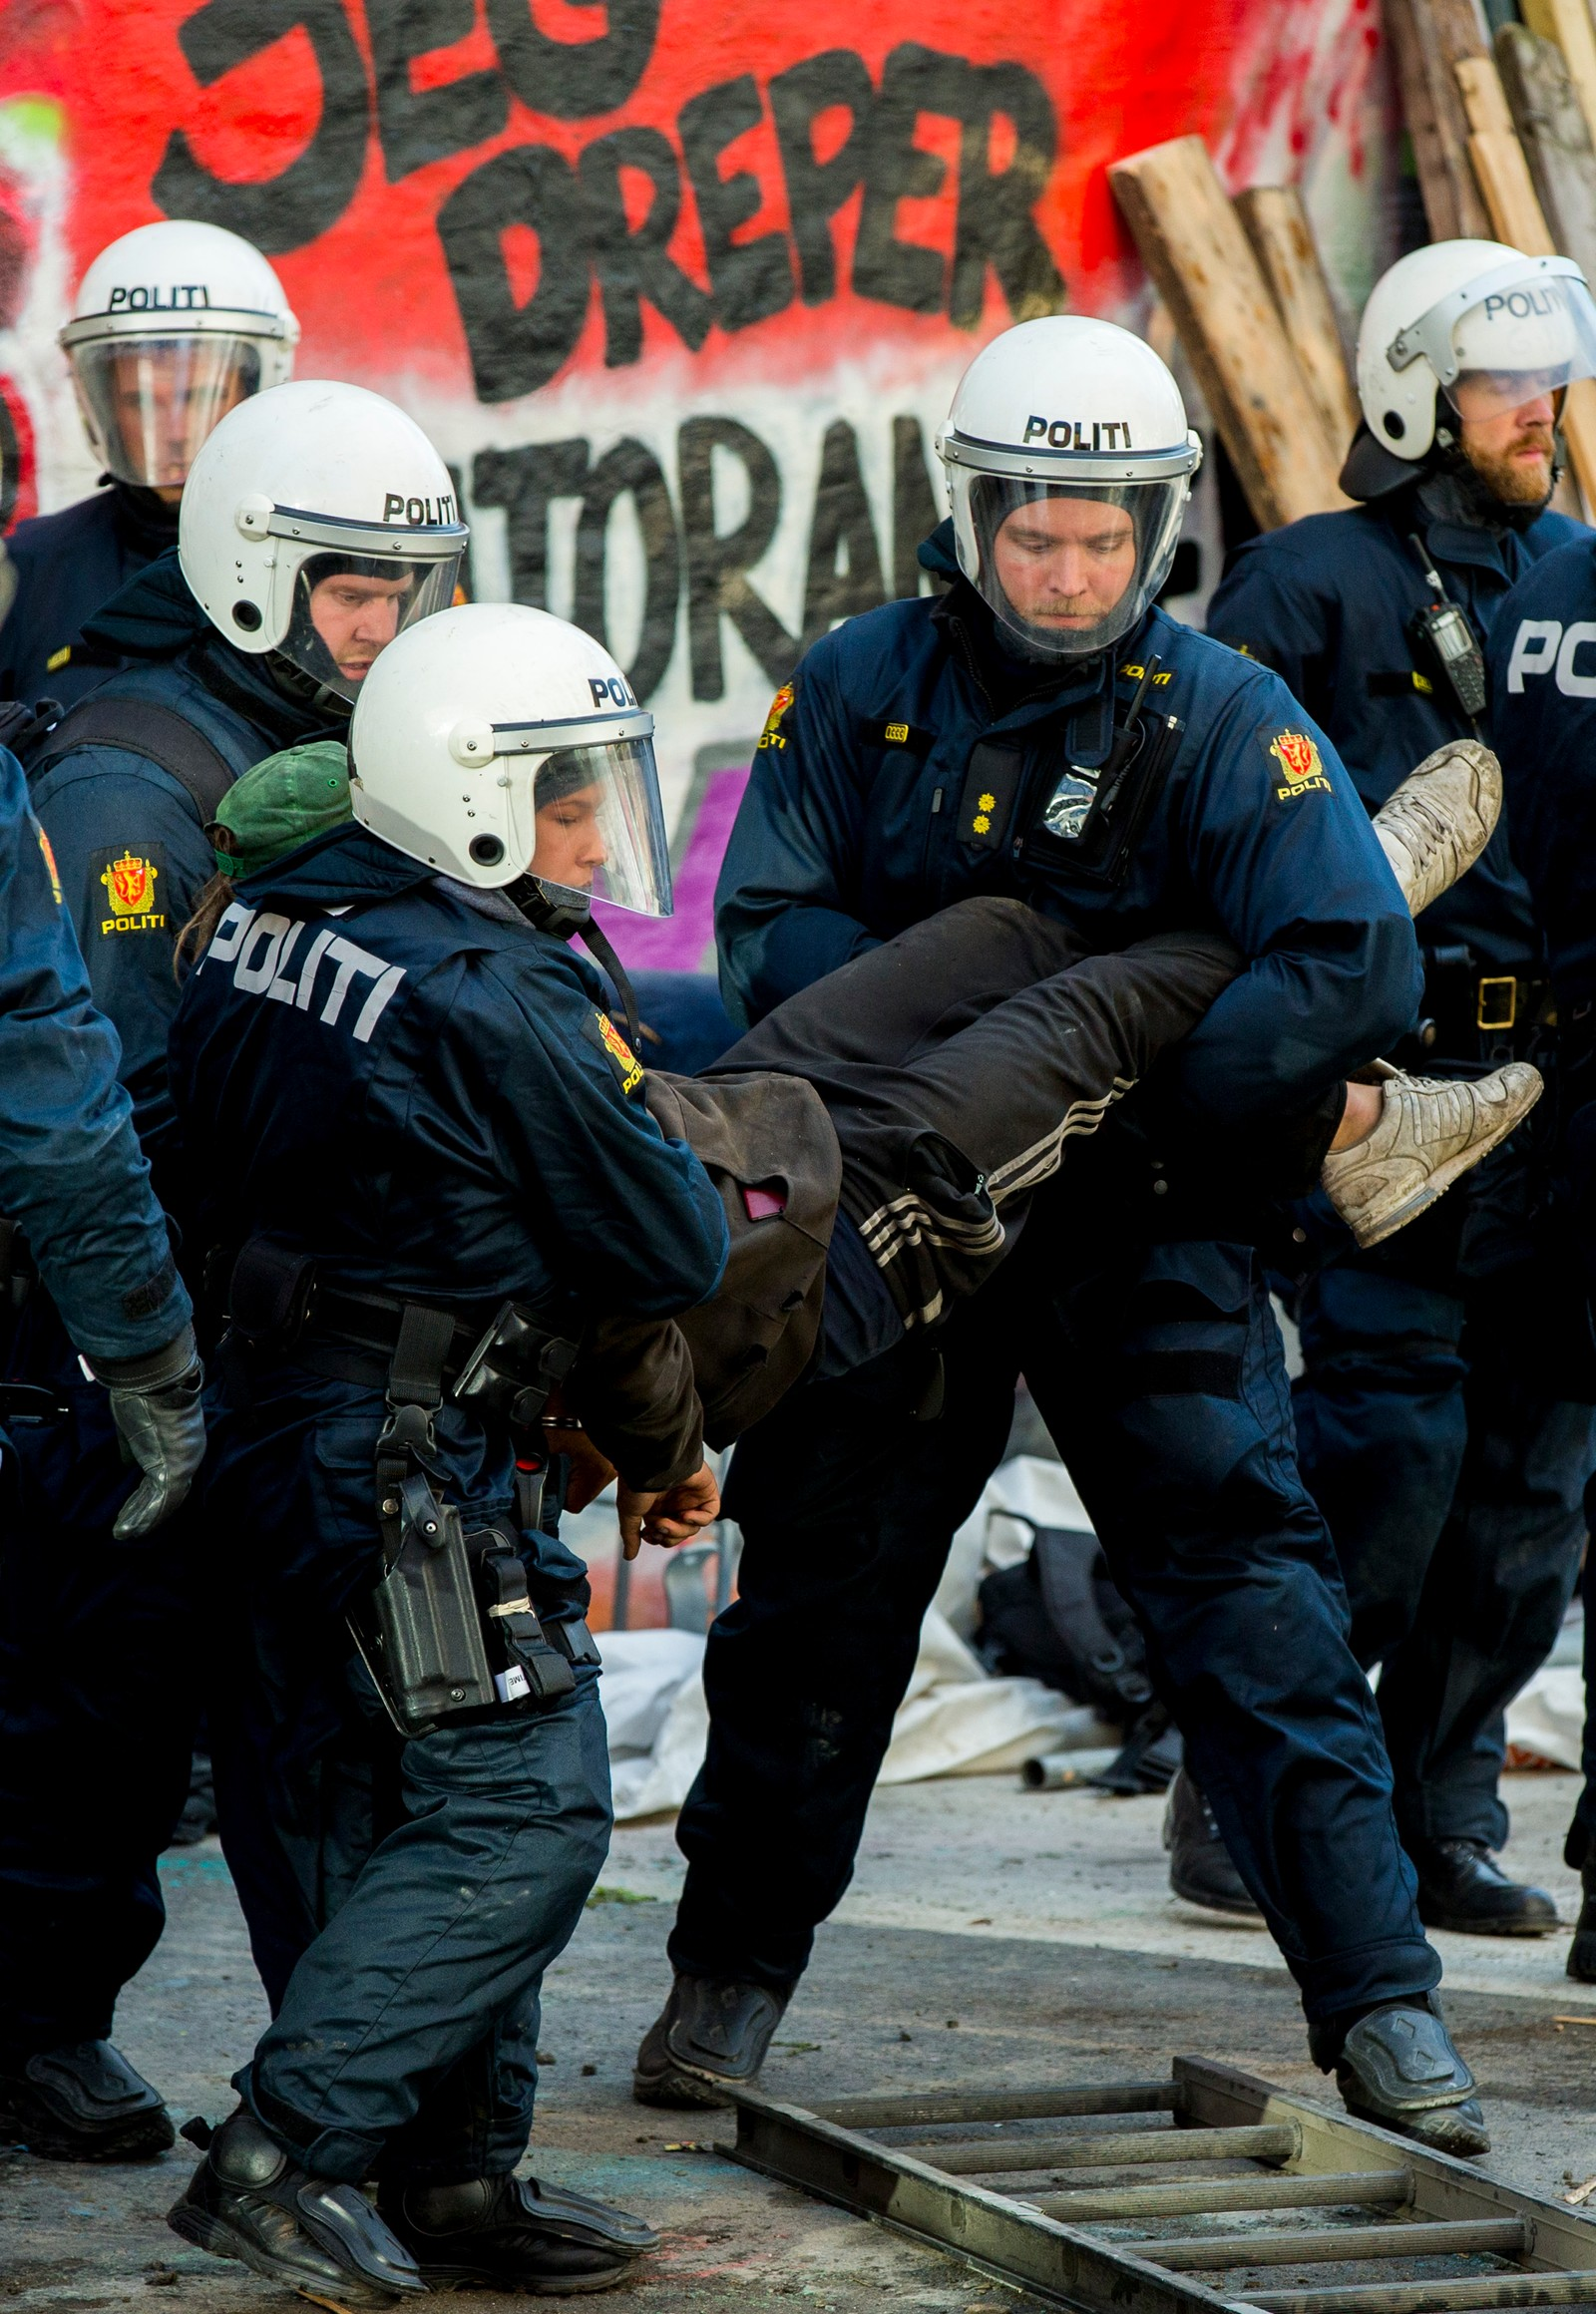 Oslo 20160706. Politiet bistår Namsfogden med å kaste ut personer som oppholder seg ulovlig i Hauskvartalet i Oslo onsdag morgen. Foto: Vegard Wivestad Grøtt / NTB scanpix Politiet bistår Namsfogden med å kaste ut personer som oppholder seg ulovlig i Hauskvartalet i Oslo onsdag morgen.